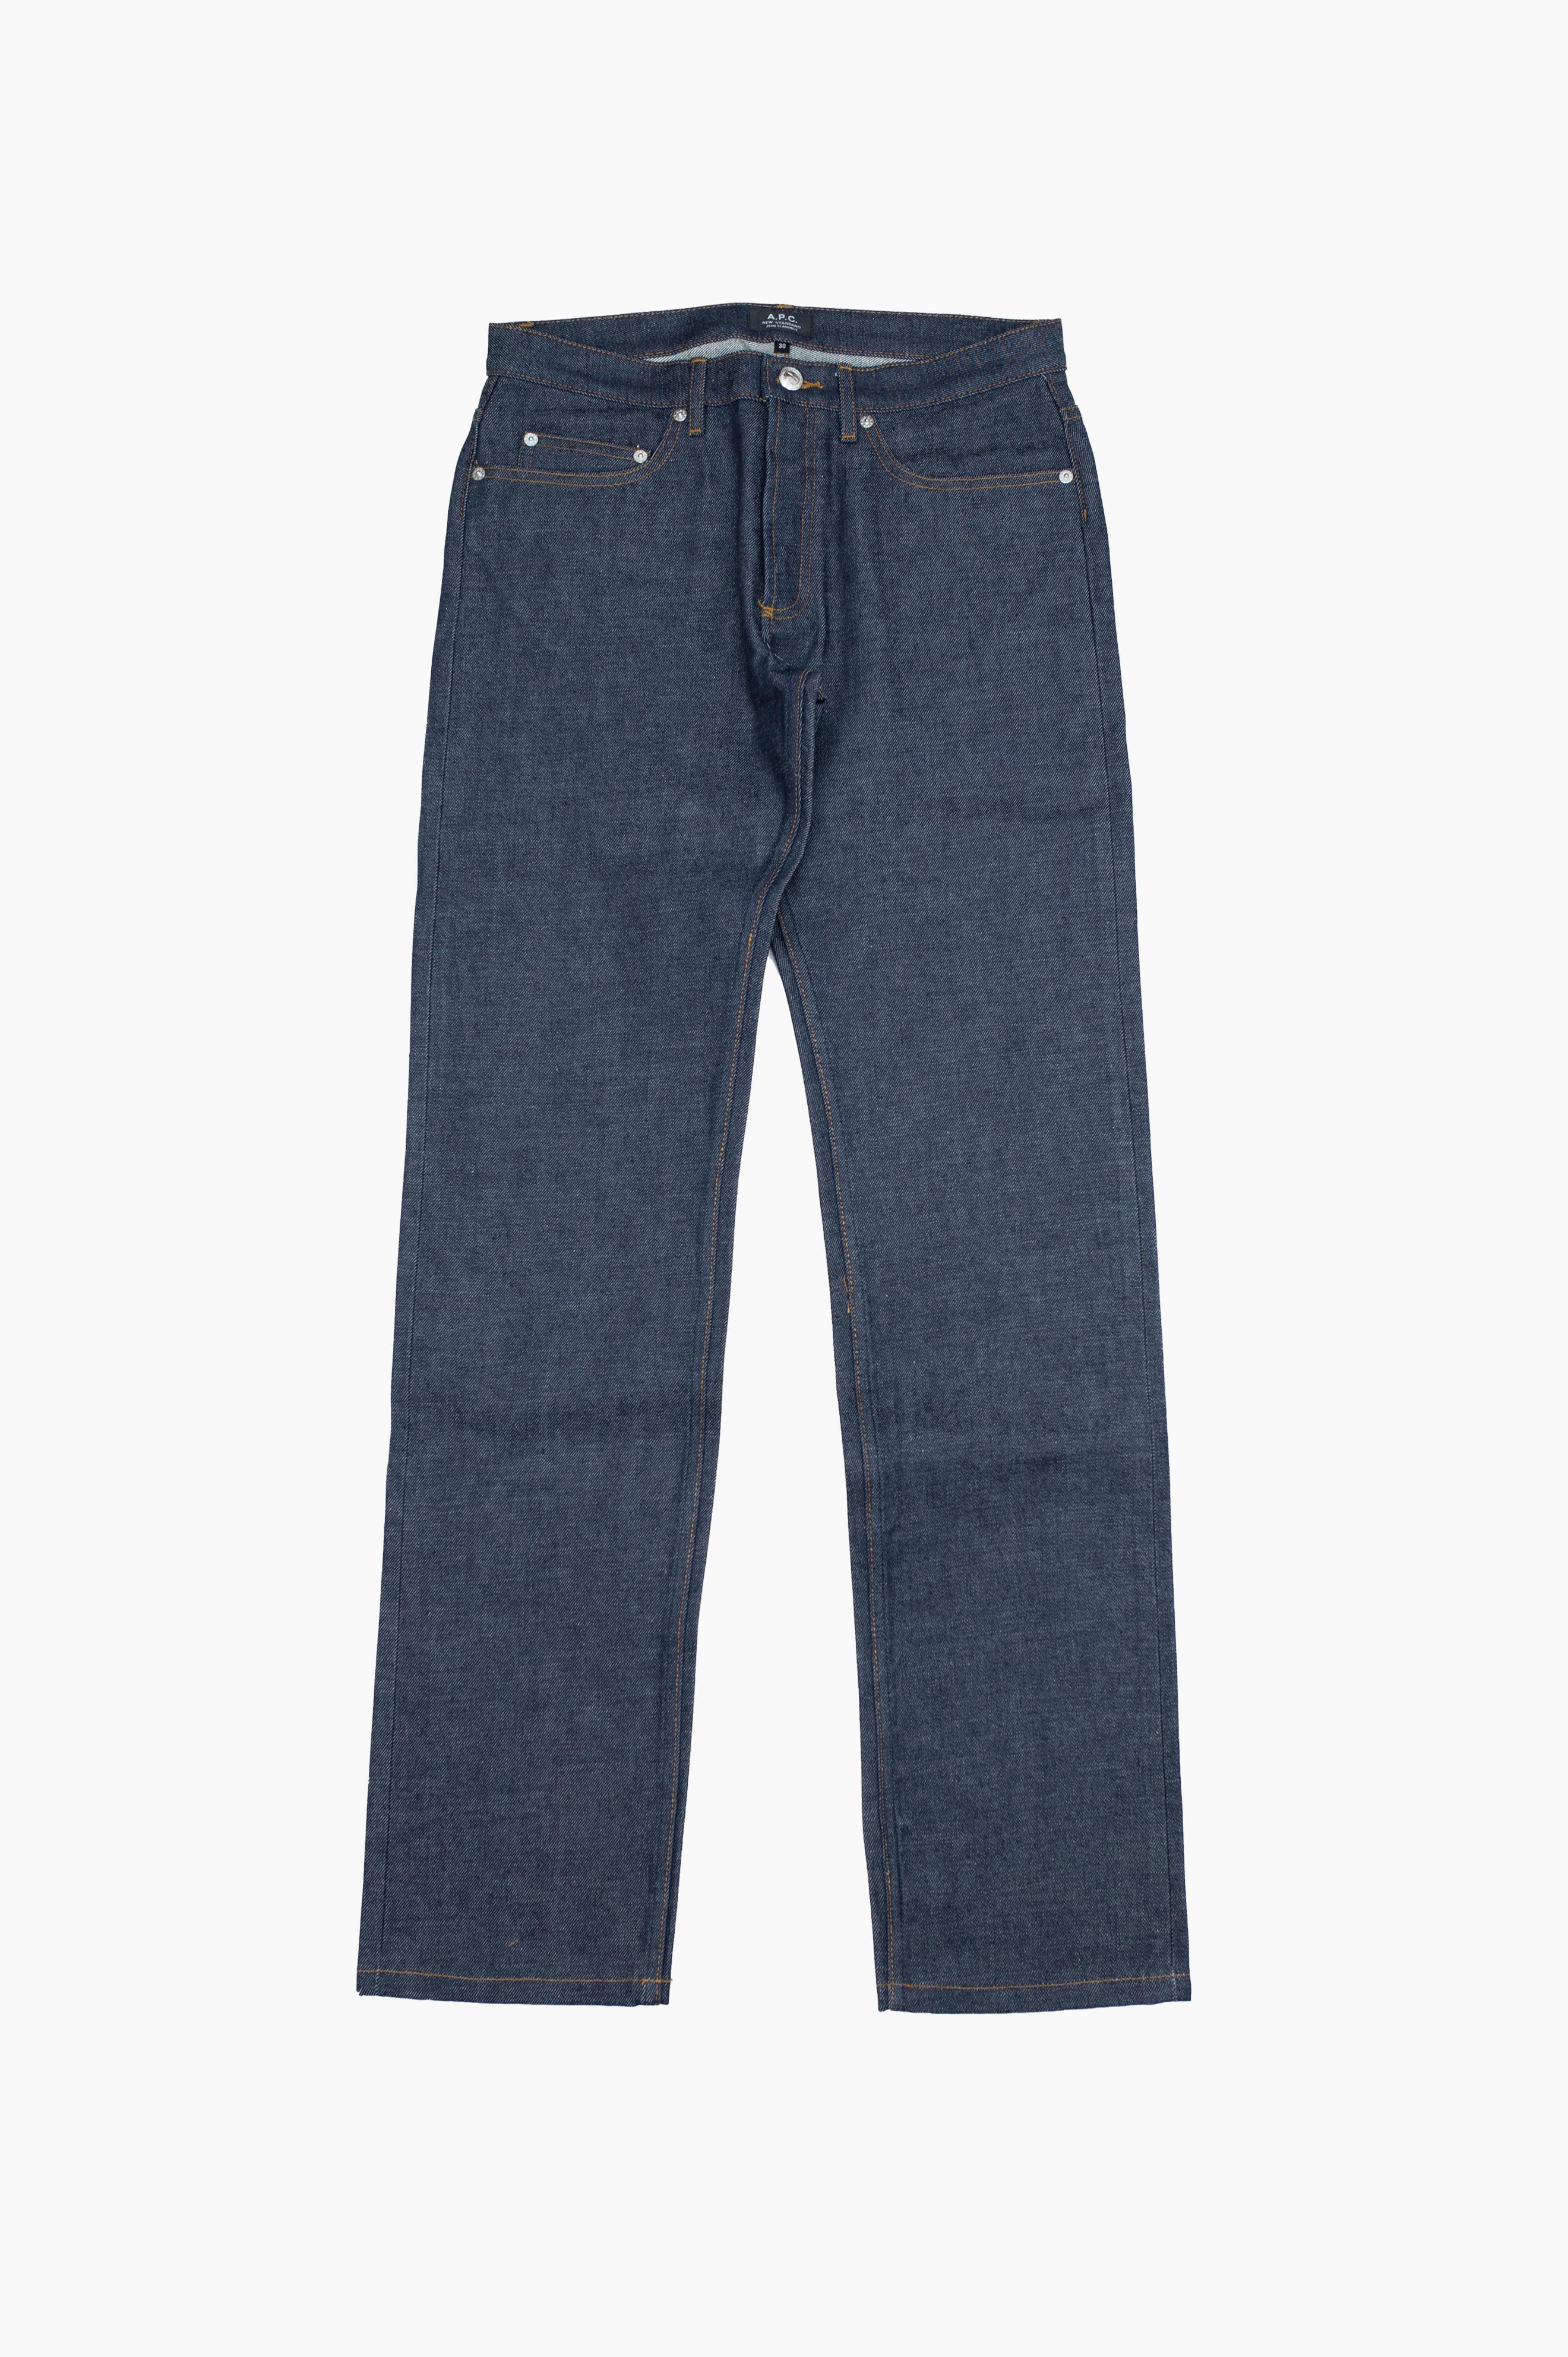 New Standard Jeans Indigo